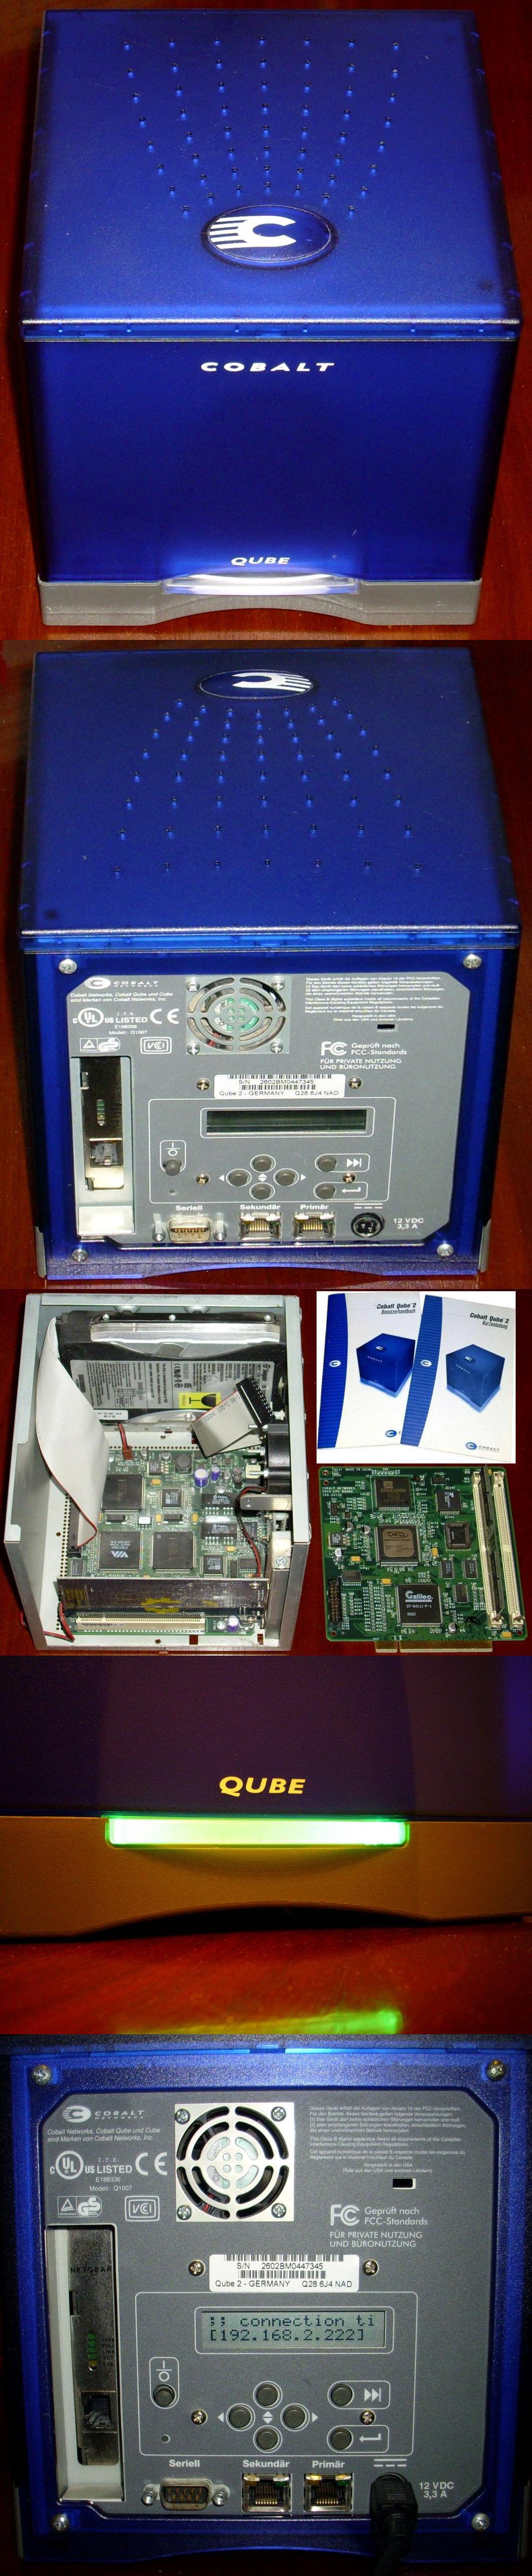 HL-DT-ST DVD-RAM GSA-H55L ATA Device - updated driver FOUND